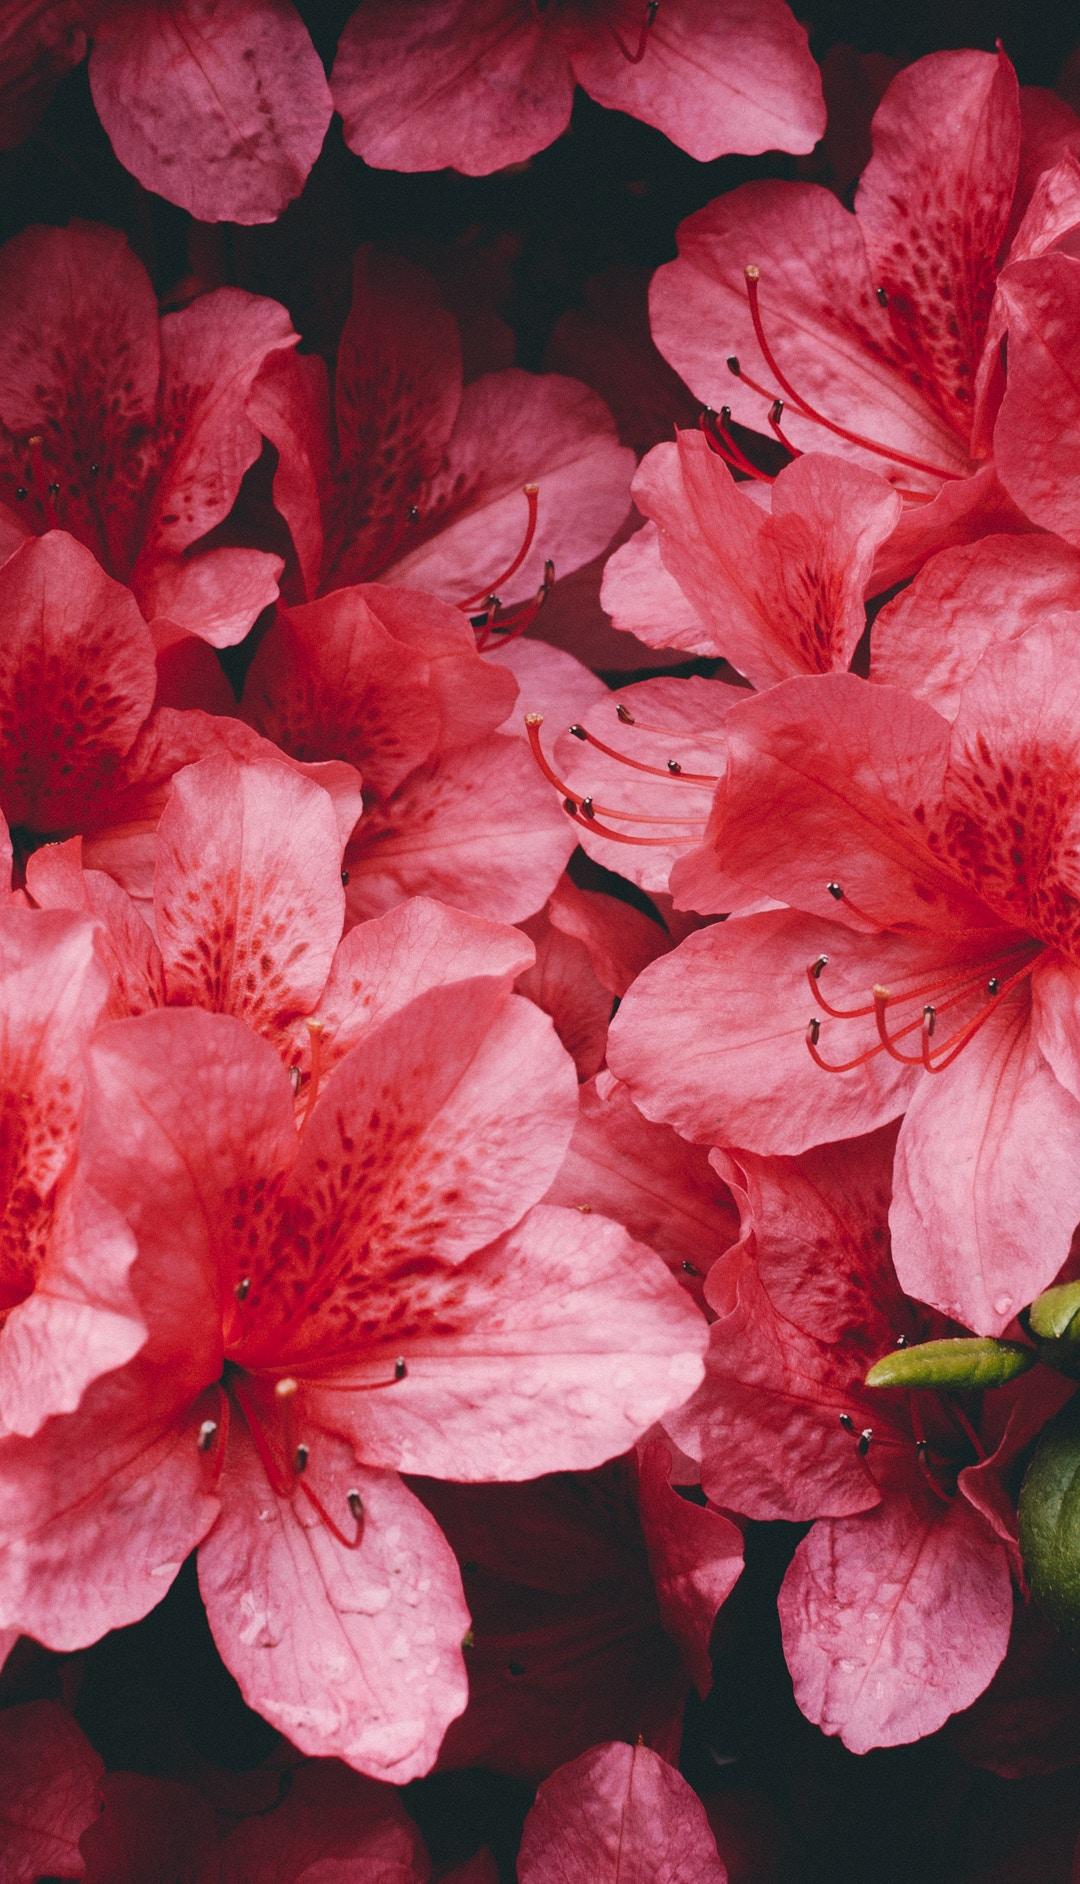 Leafe, Bloom iPhone Wallpaper